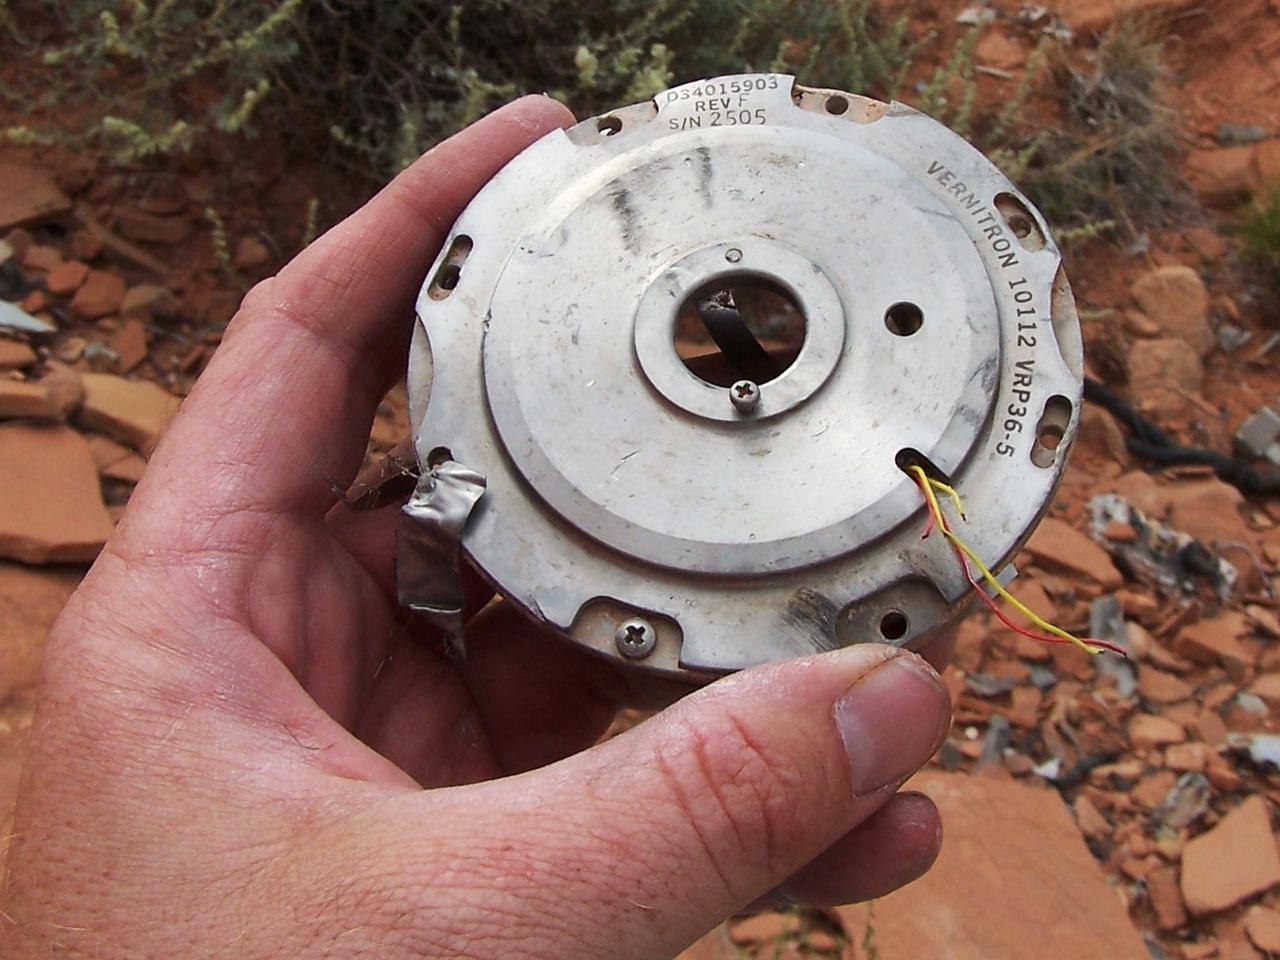 A cap/cover assembly from a Vernitron pressure sensor.